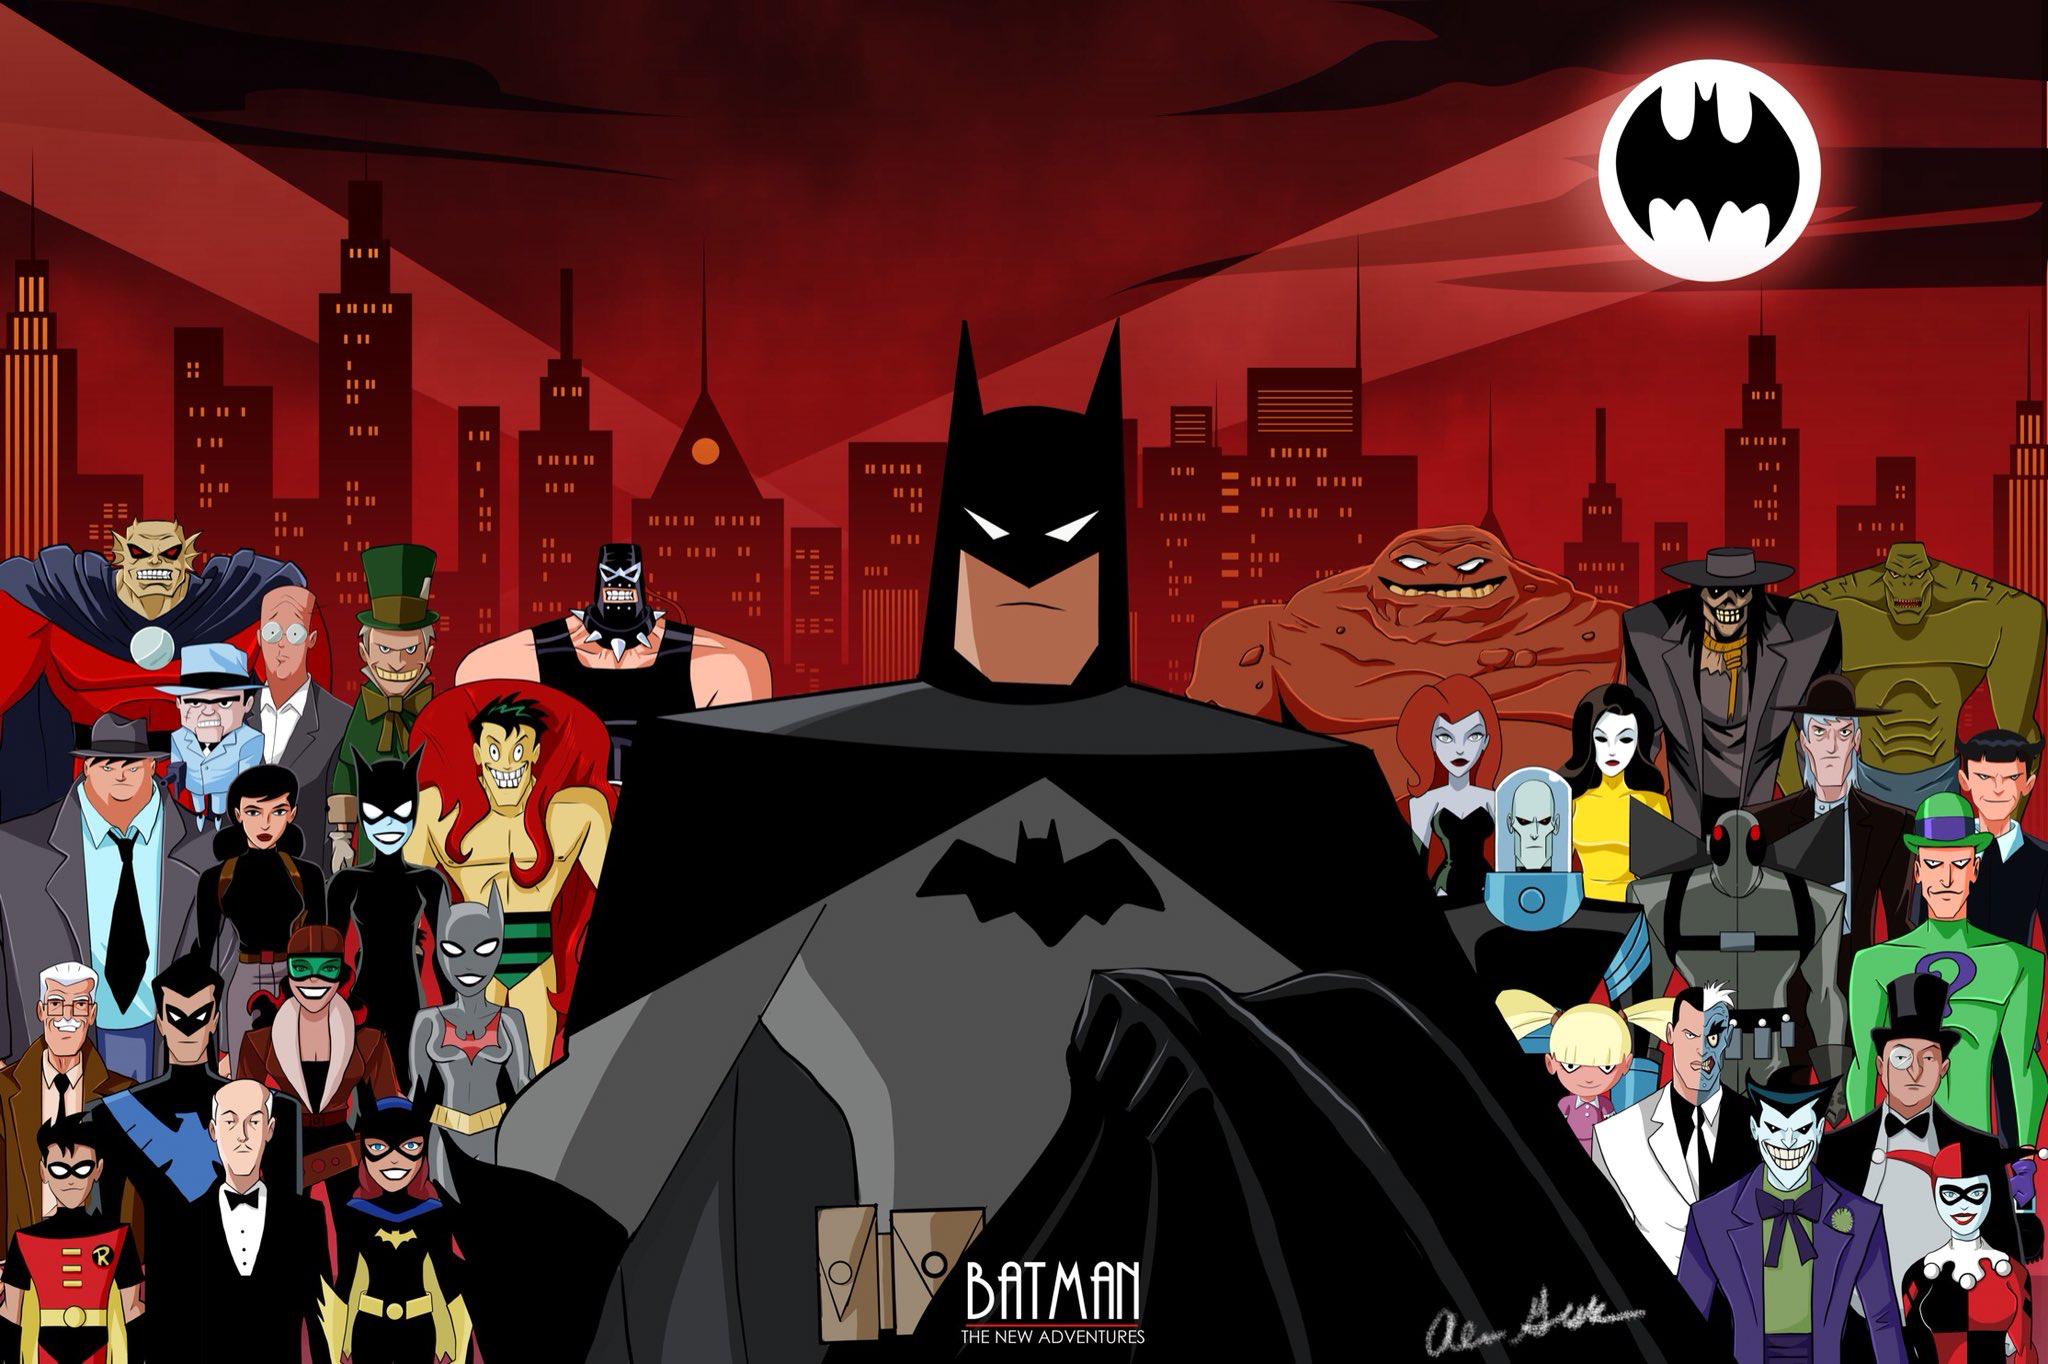 Pin By Kenya Garcia On Posters Batman Comics Batman Cartoon Batman The Animated Series